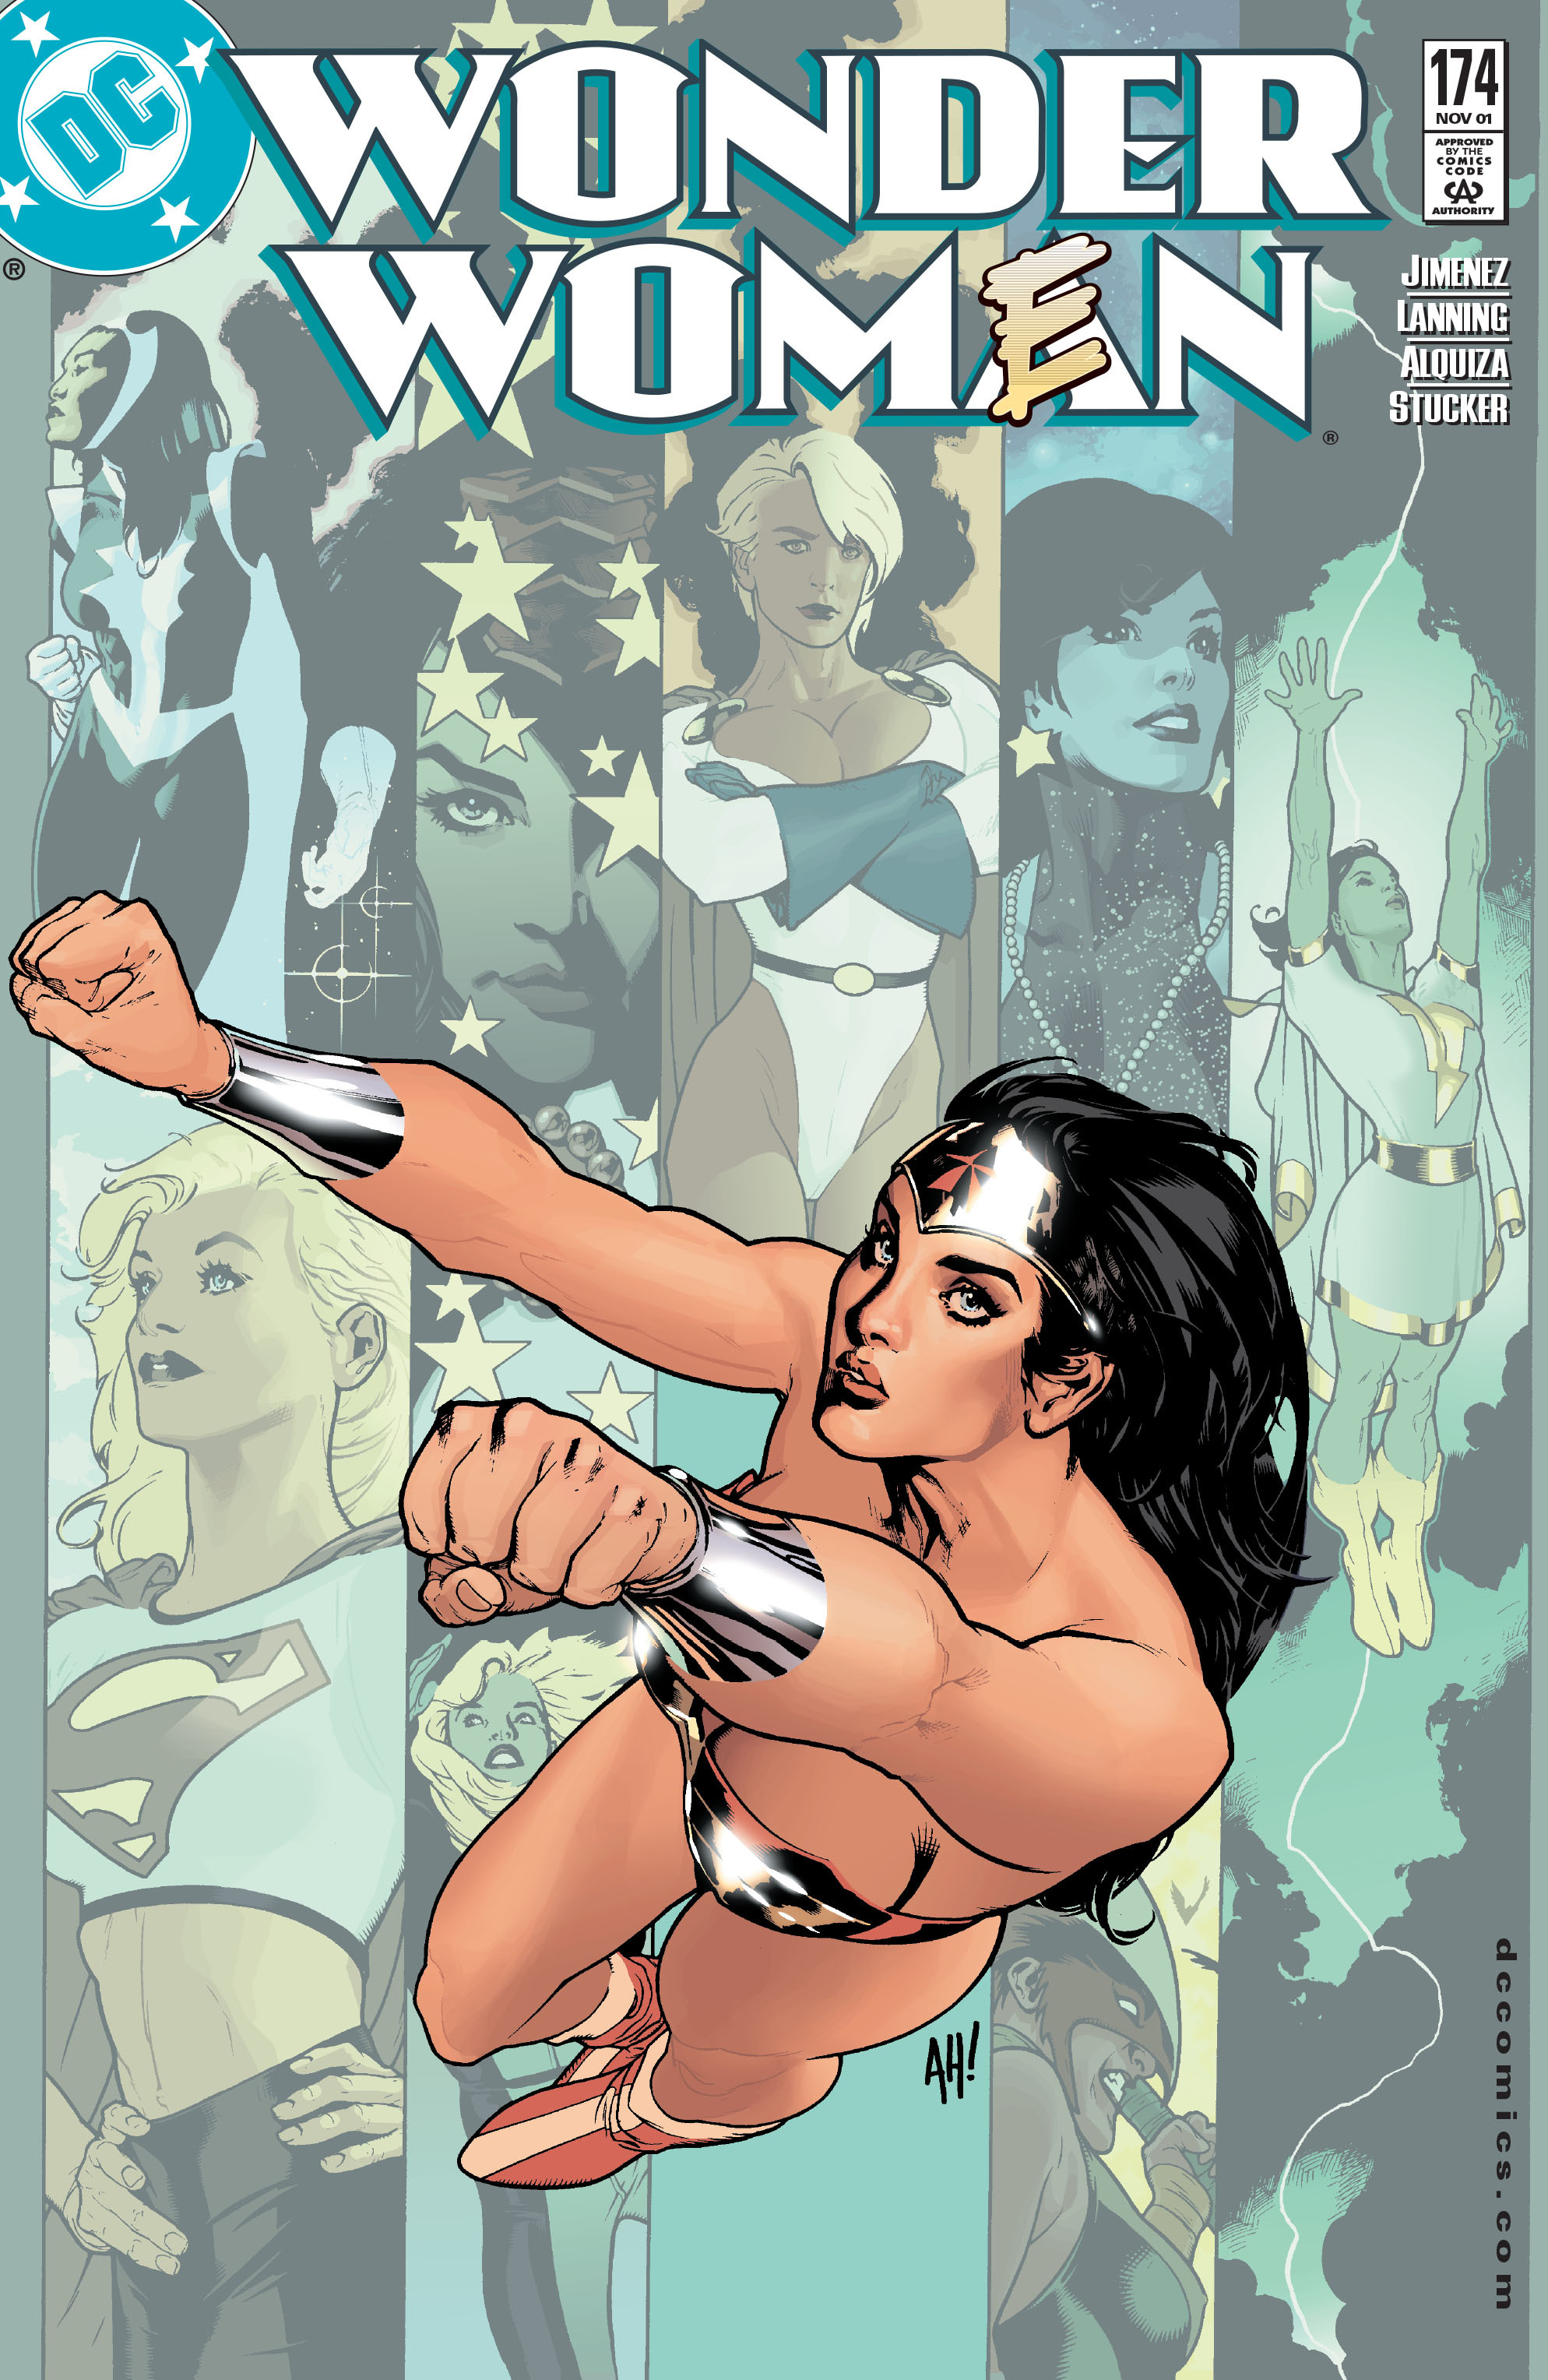 Read online Wonder Woman (1987) comic -  Issue #174 - 1